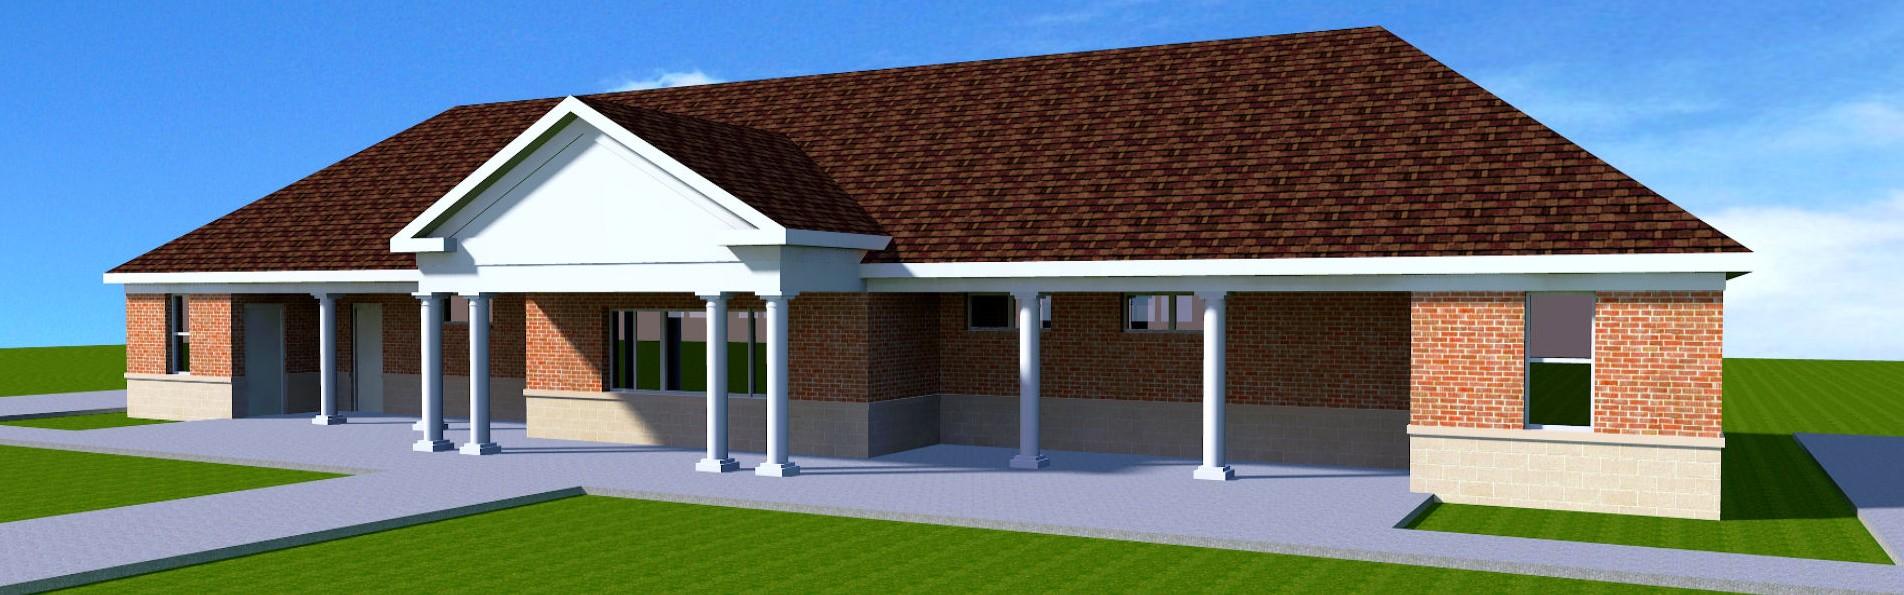 SAU athletic facilities to see major improvements